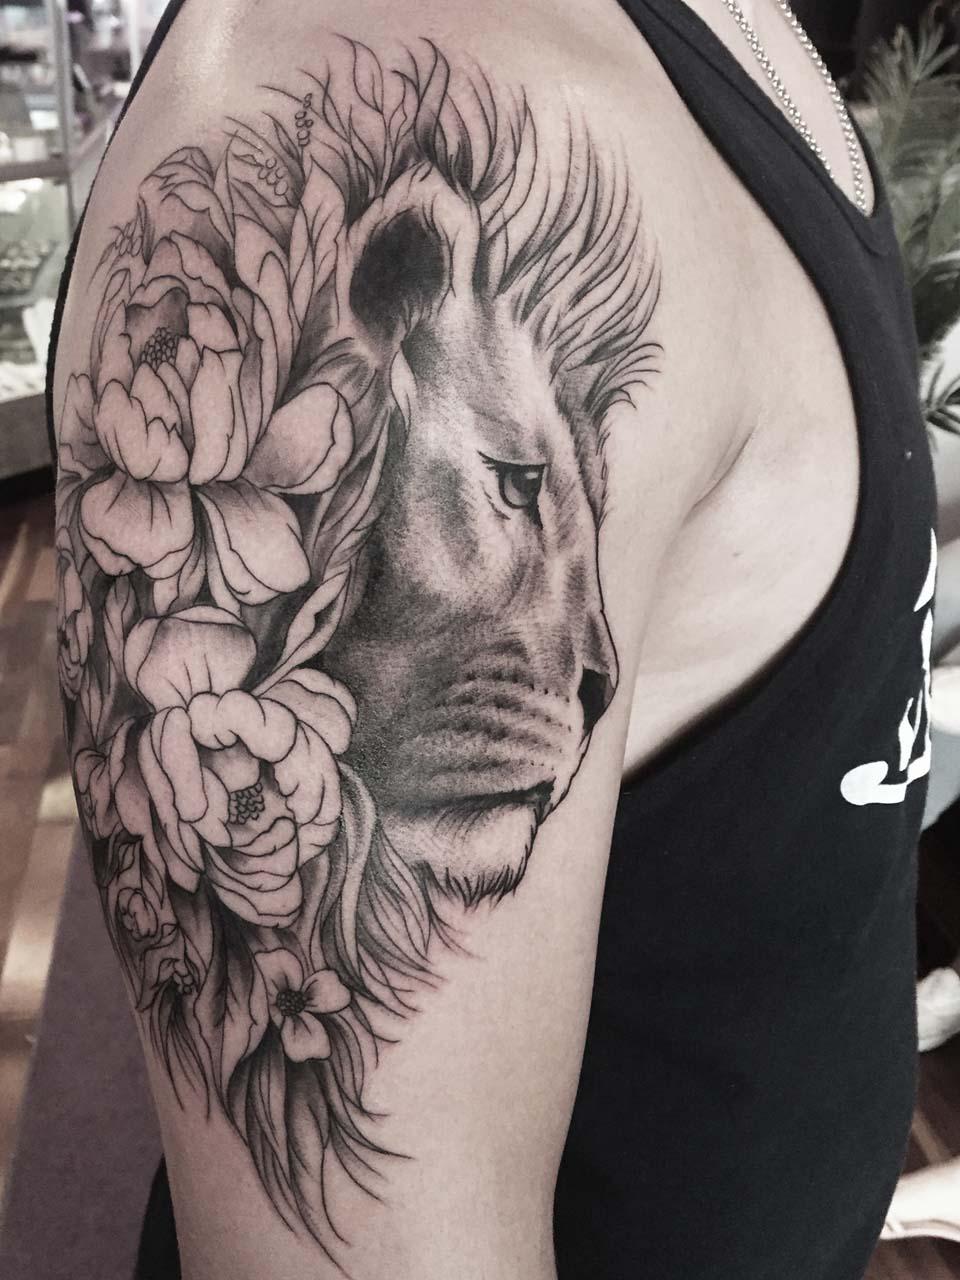 kevin-deuso-tattoo-017-black-upper-arm